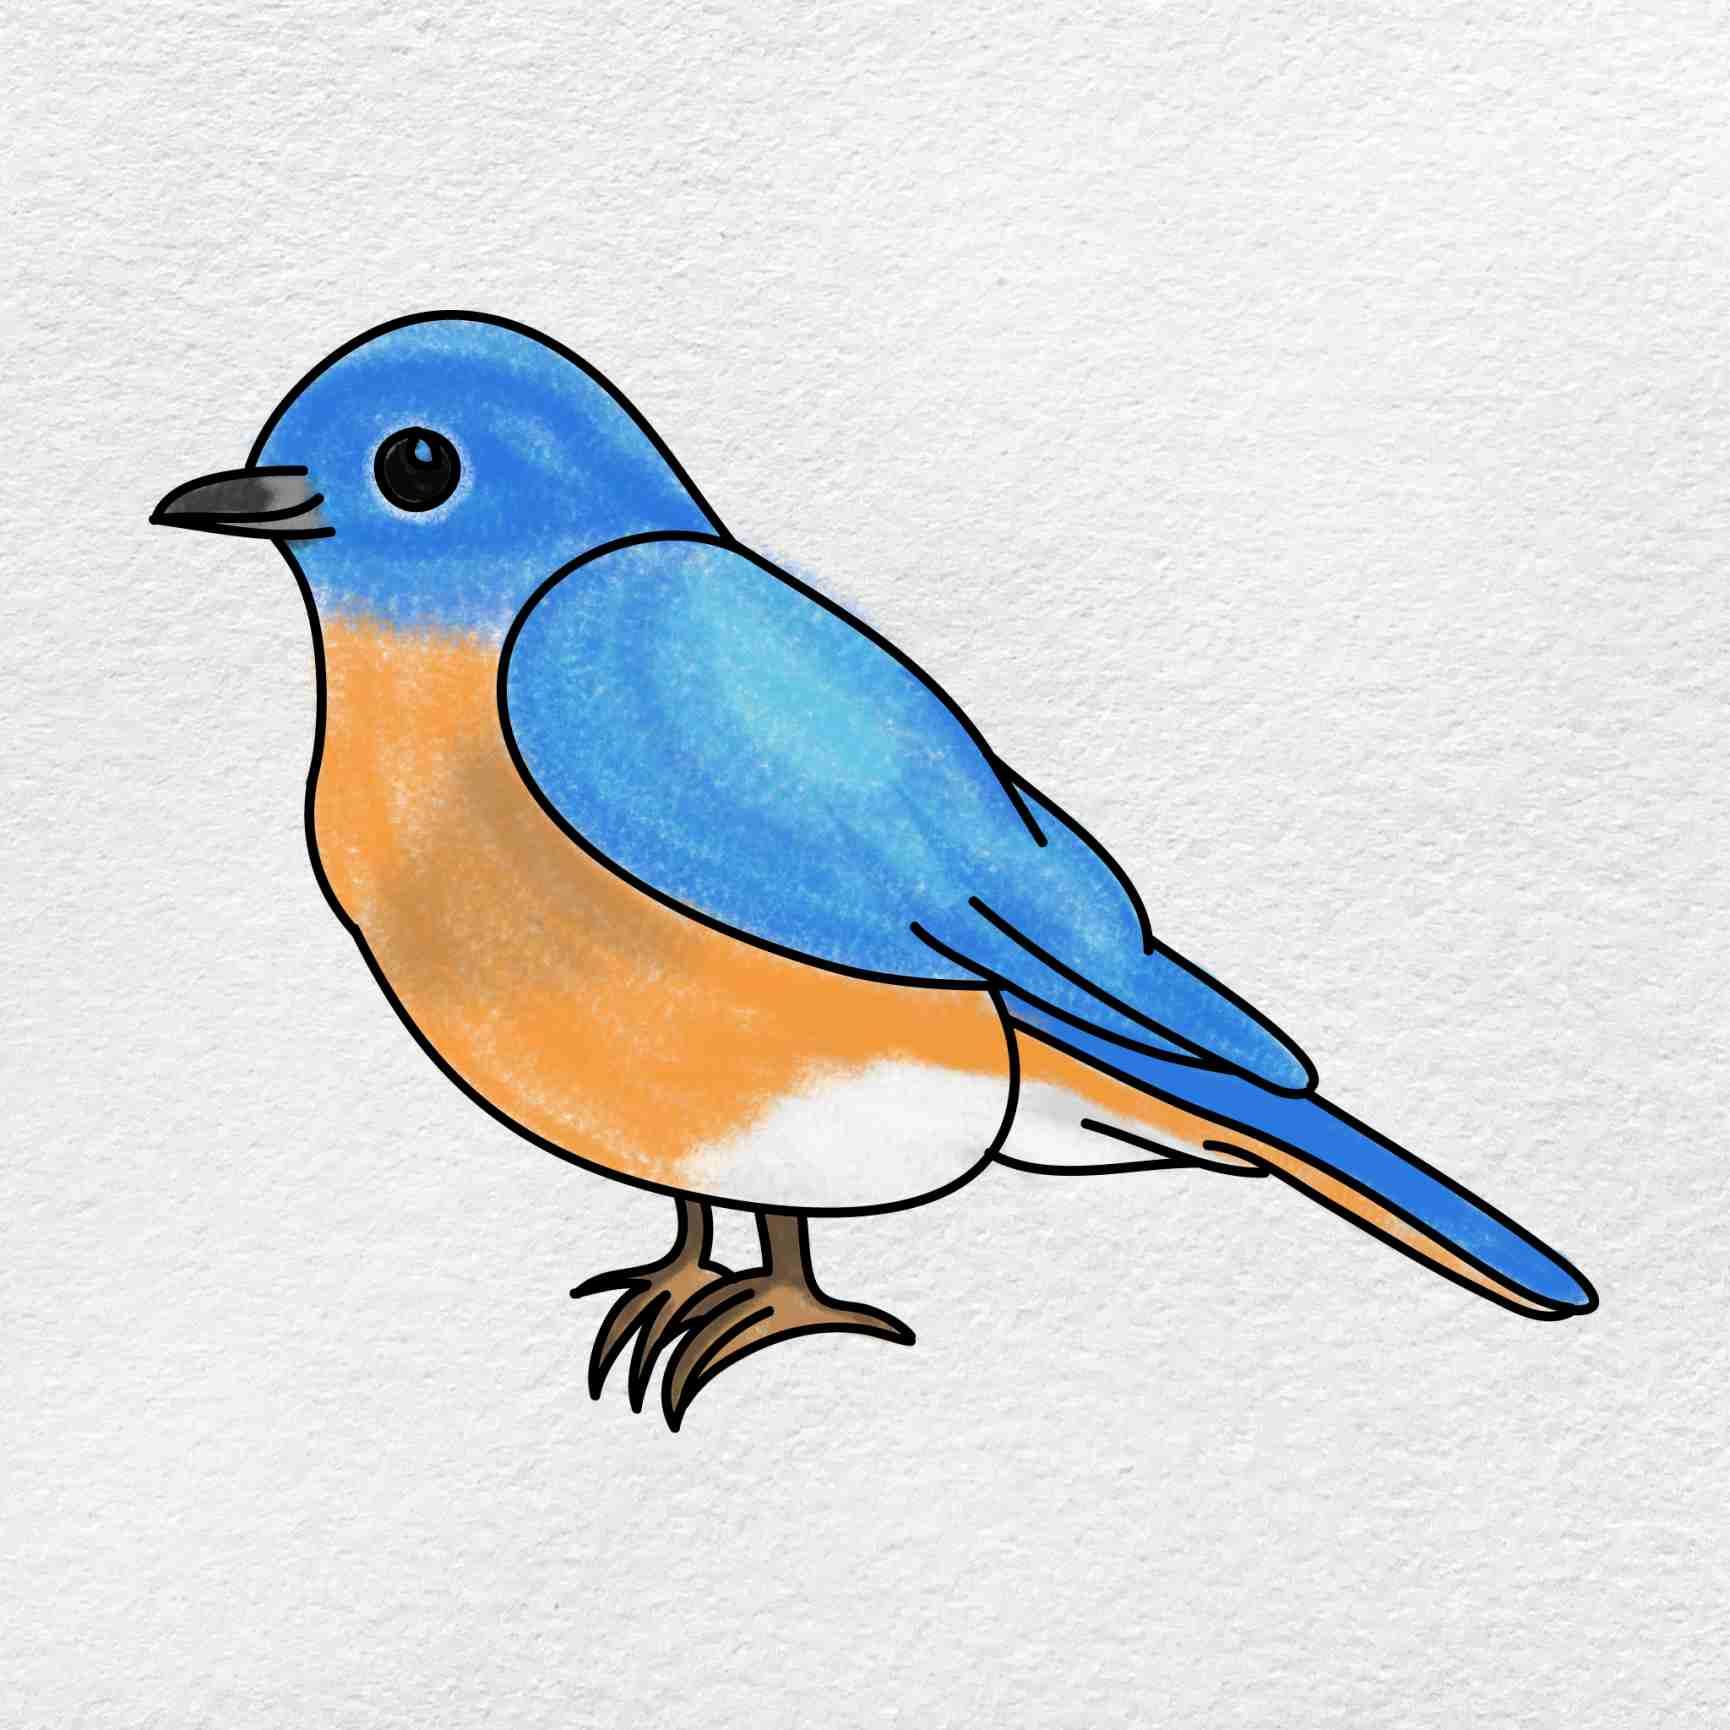 Bluebird Drawing: Step 6